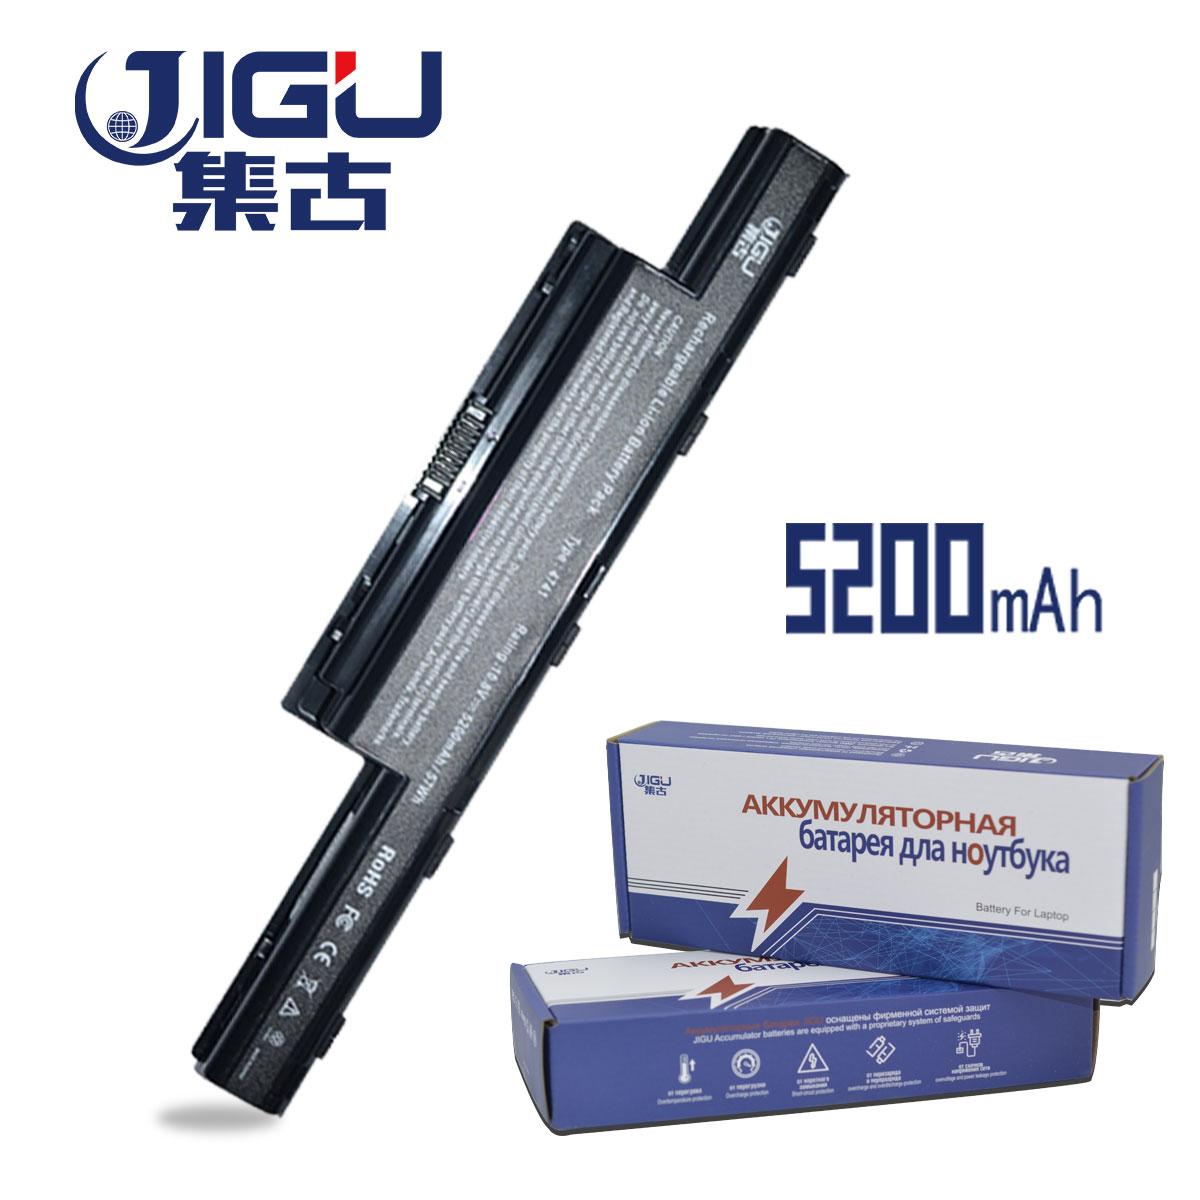 JIGU Батарея для acer Aspire 5349 5560 г 5741 г 5742 г 5750 г V3 AS10D31 AS10D41 AS10D51 AS10D61 AS10D71 AS10D73 AS10D75 AS10D81 ...